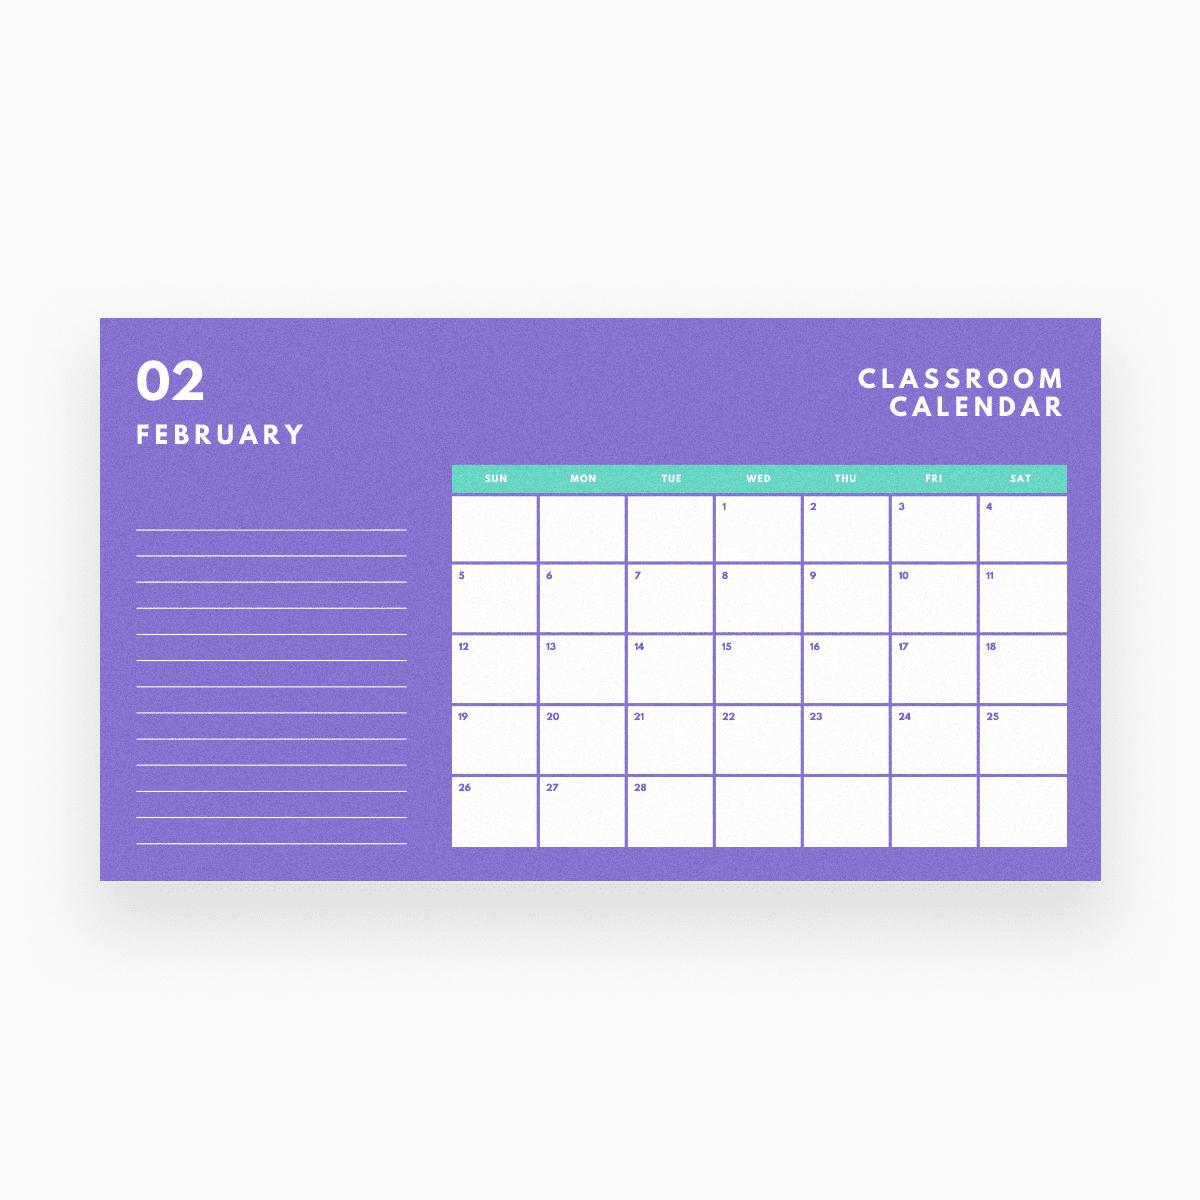 Free Online Calendar Maker: Design A Custom Calendar - Canva Fre Fill In Online Calendars